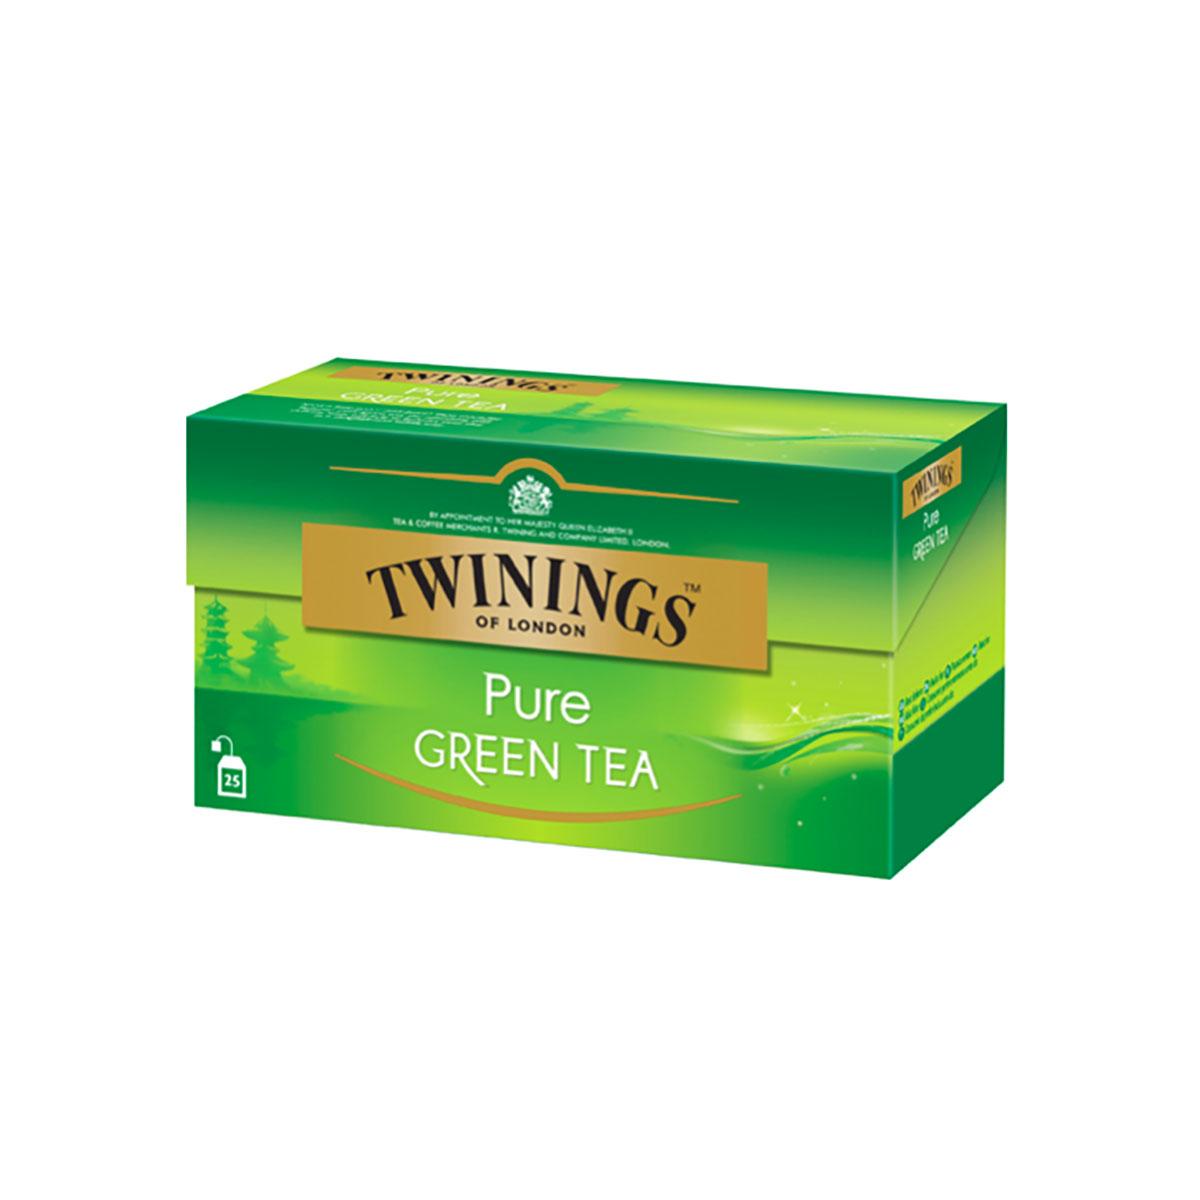 Ceai verde pur Twinings, 25 x 2 g imagine